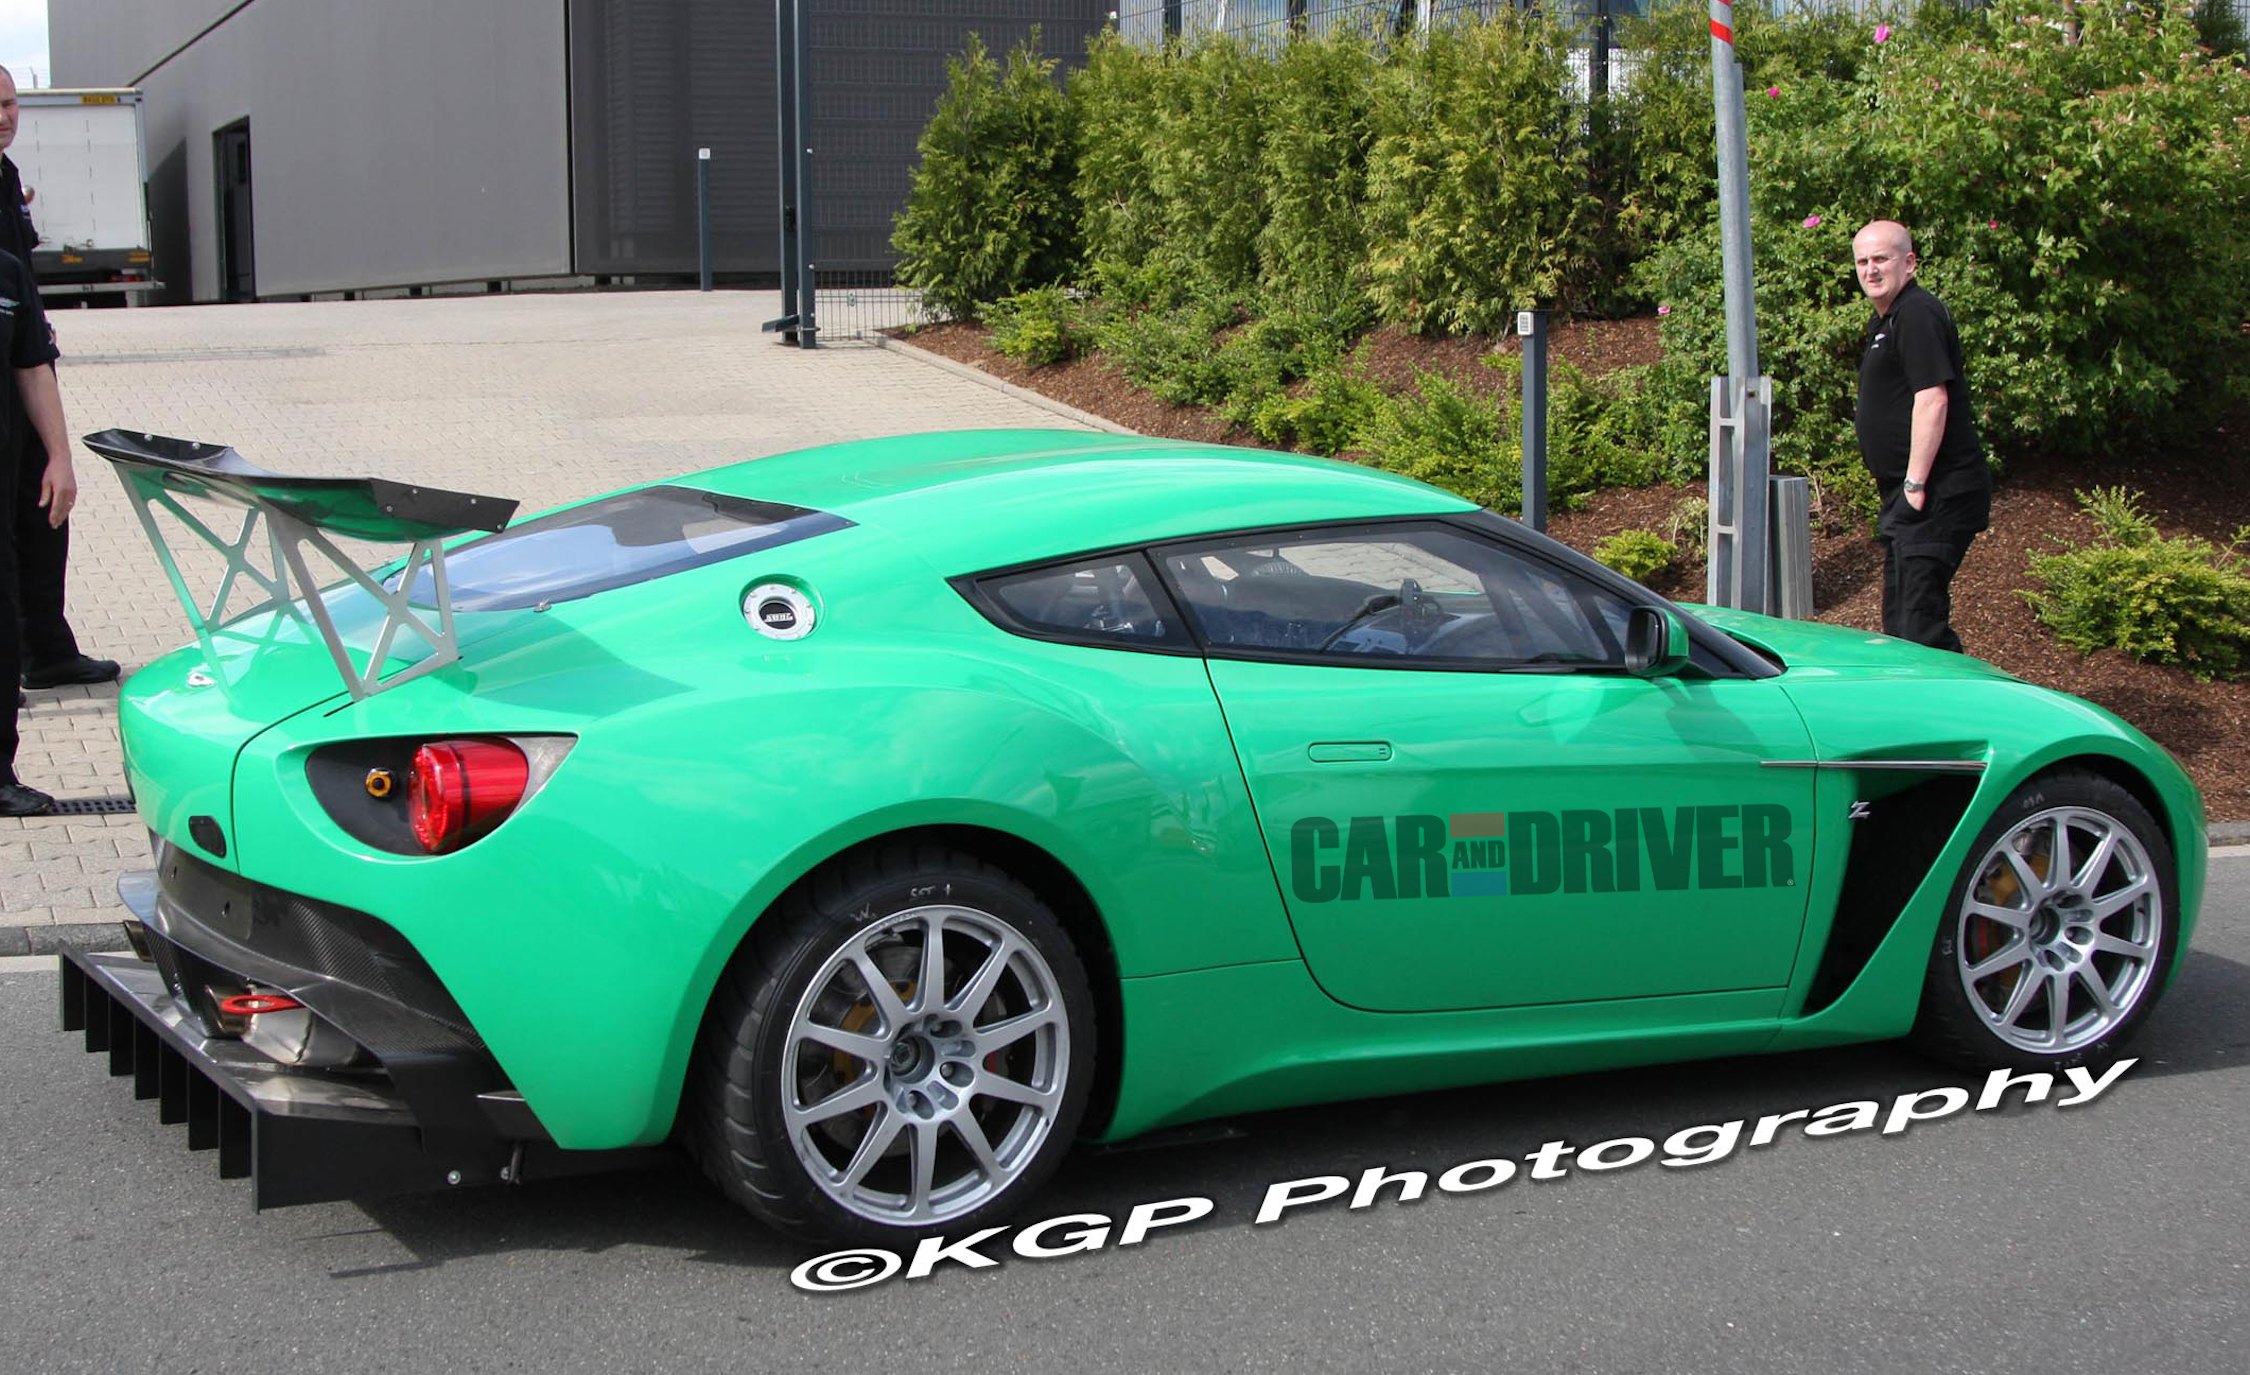 HD Quality Wallpaper | Collection: Vehicles, 2250x1375 Aston Martin V12 Zagato